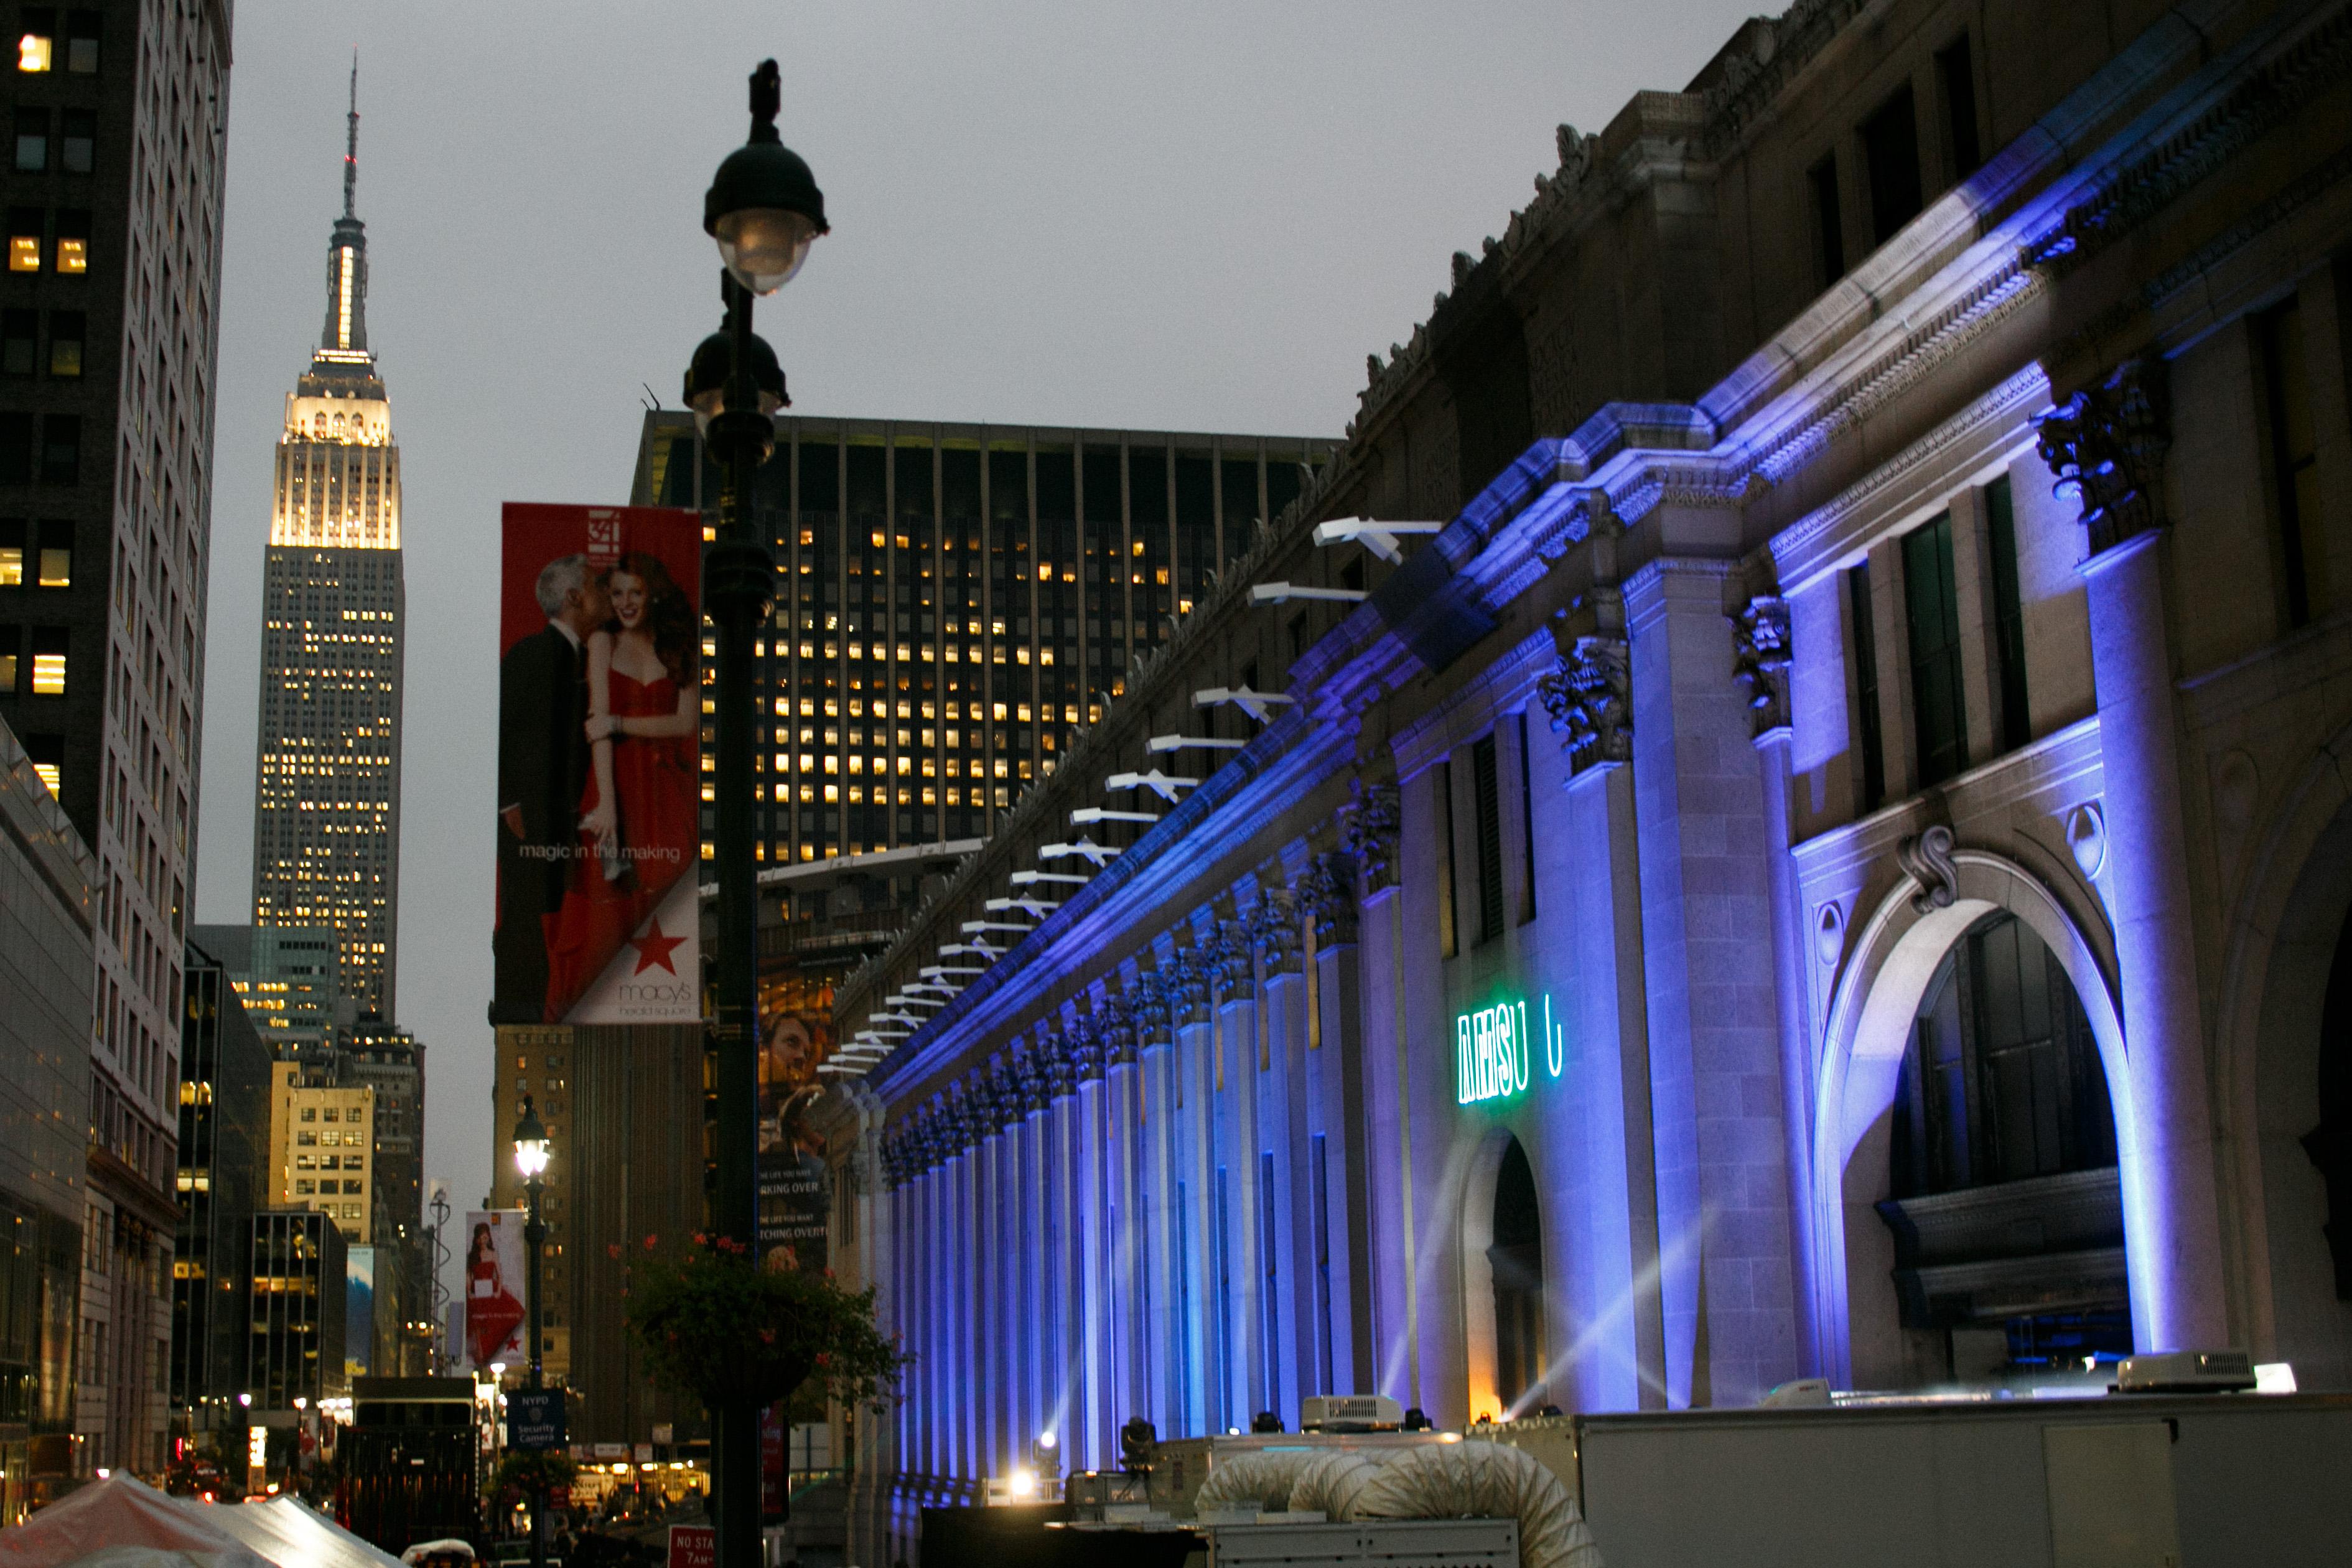 Skylight at Moynihan Station's facade lit up at night. Photo: Allan Zepeda/Skylight NYC